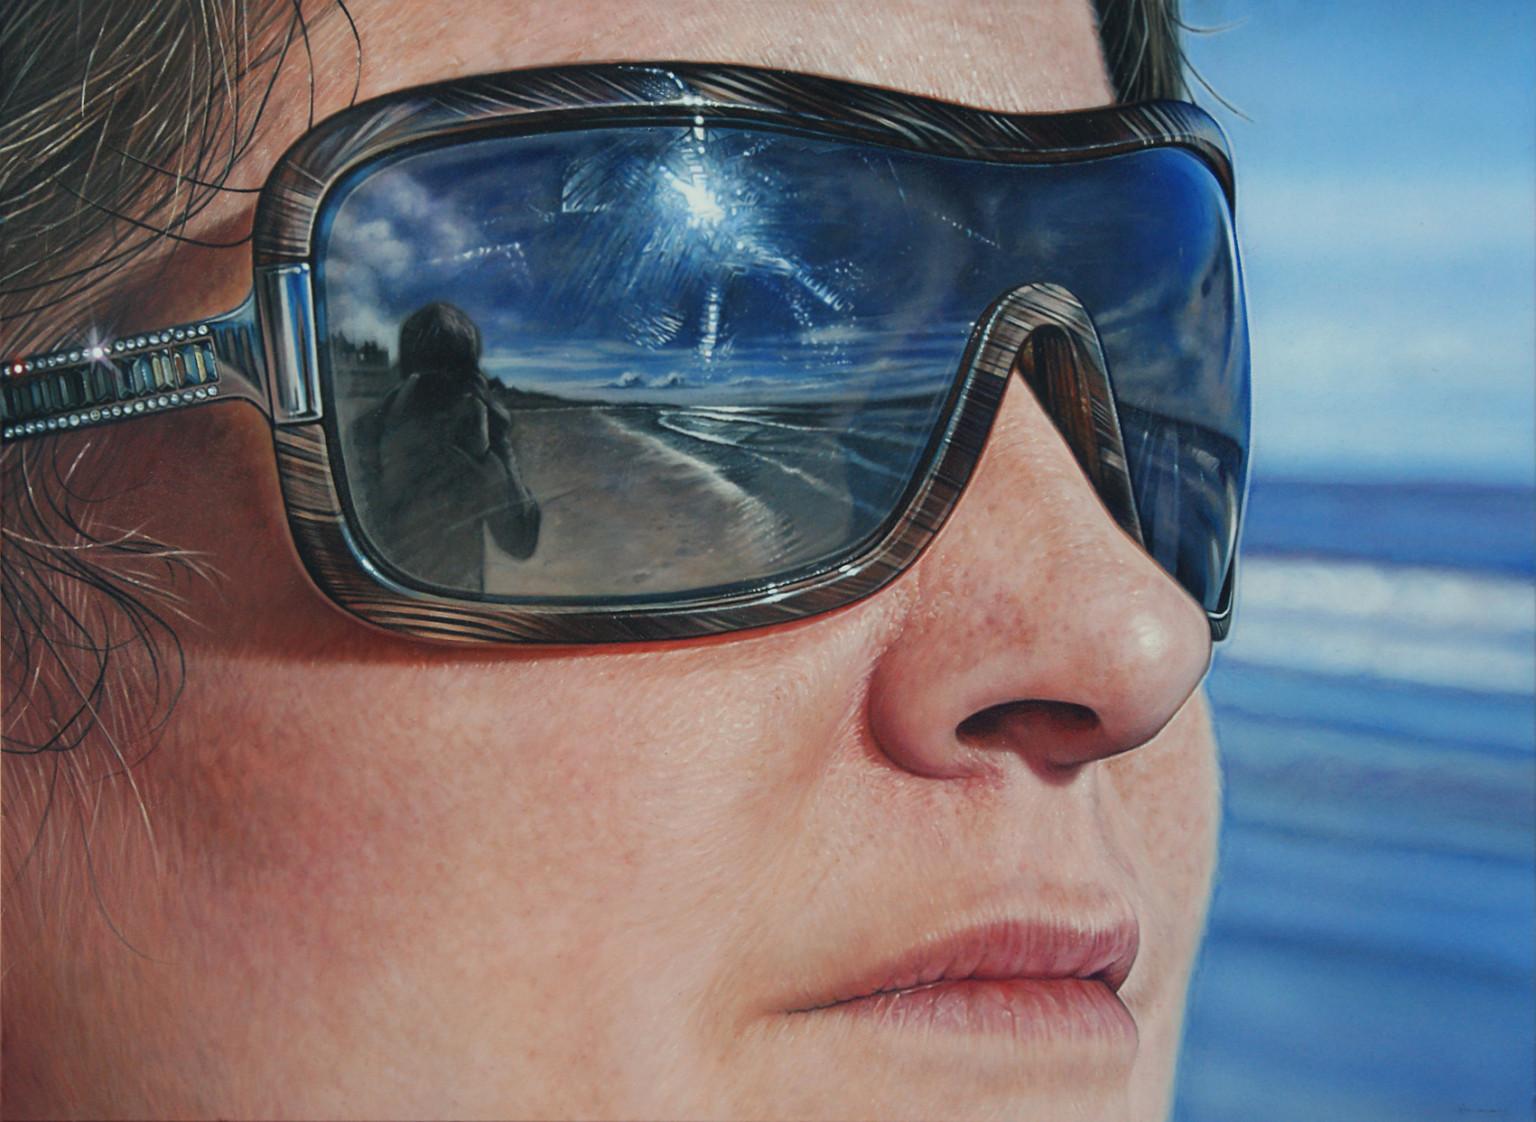 hyperrealist artist painted eyes until he got really